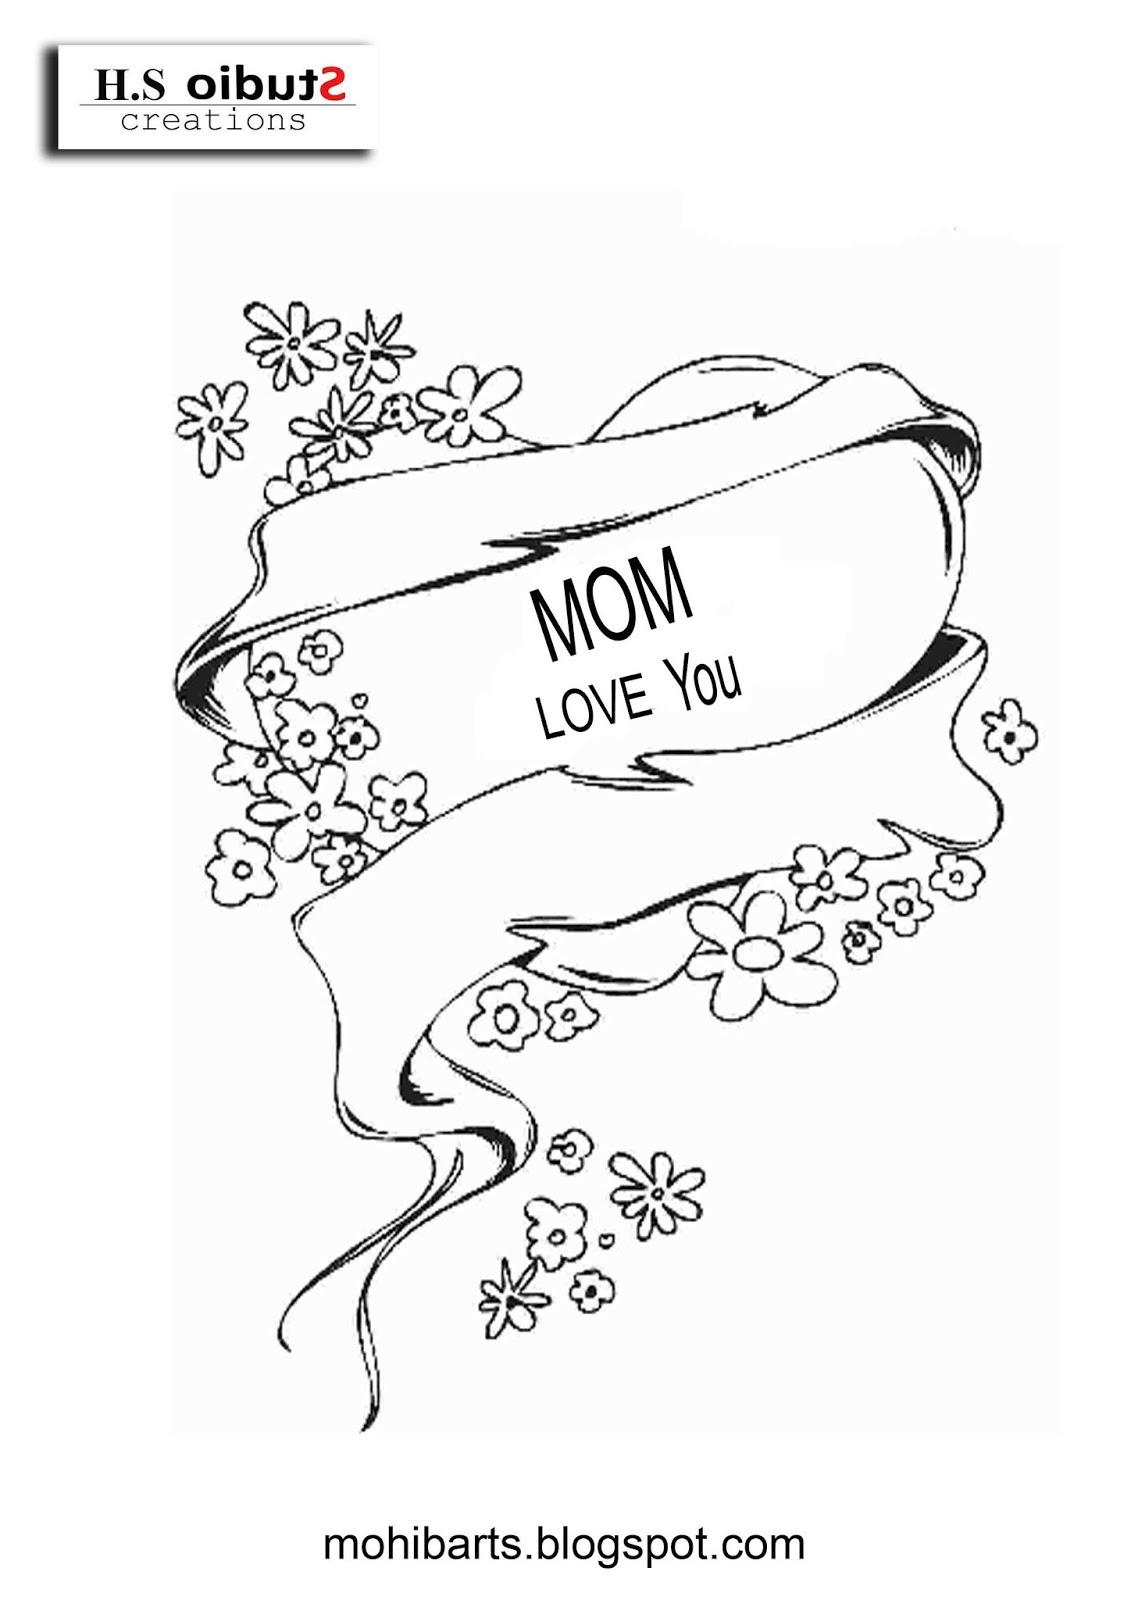 worksheet Mothers Day Worksheets creative arts printable mothers day worksheets or cards cards